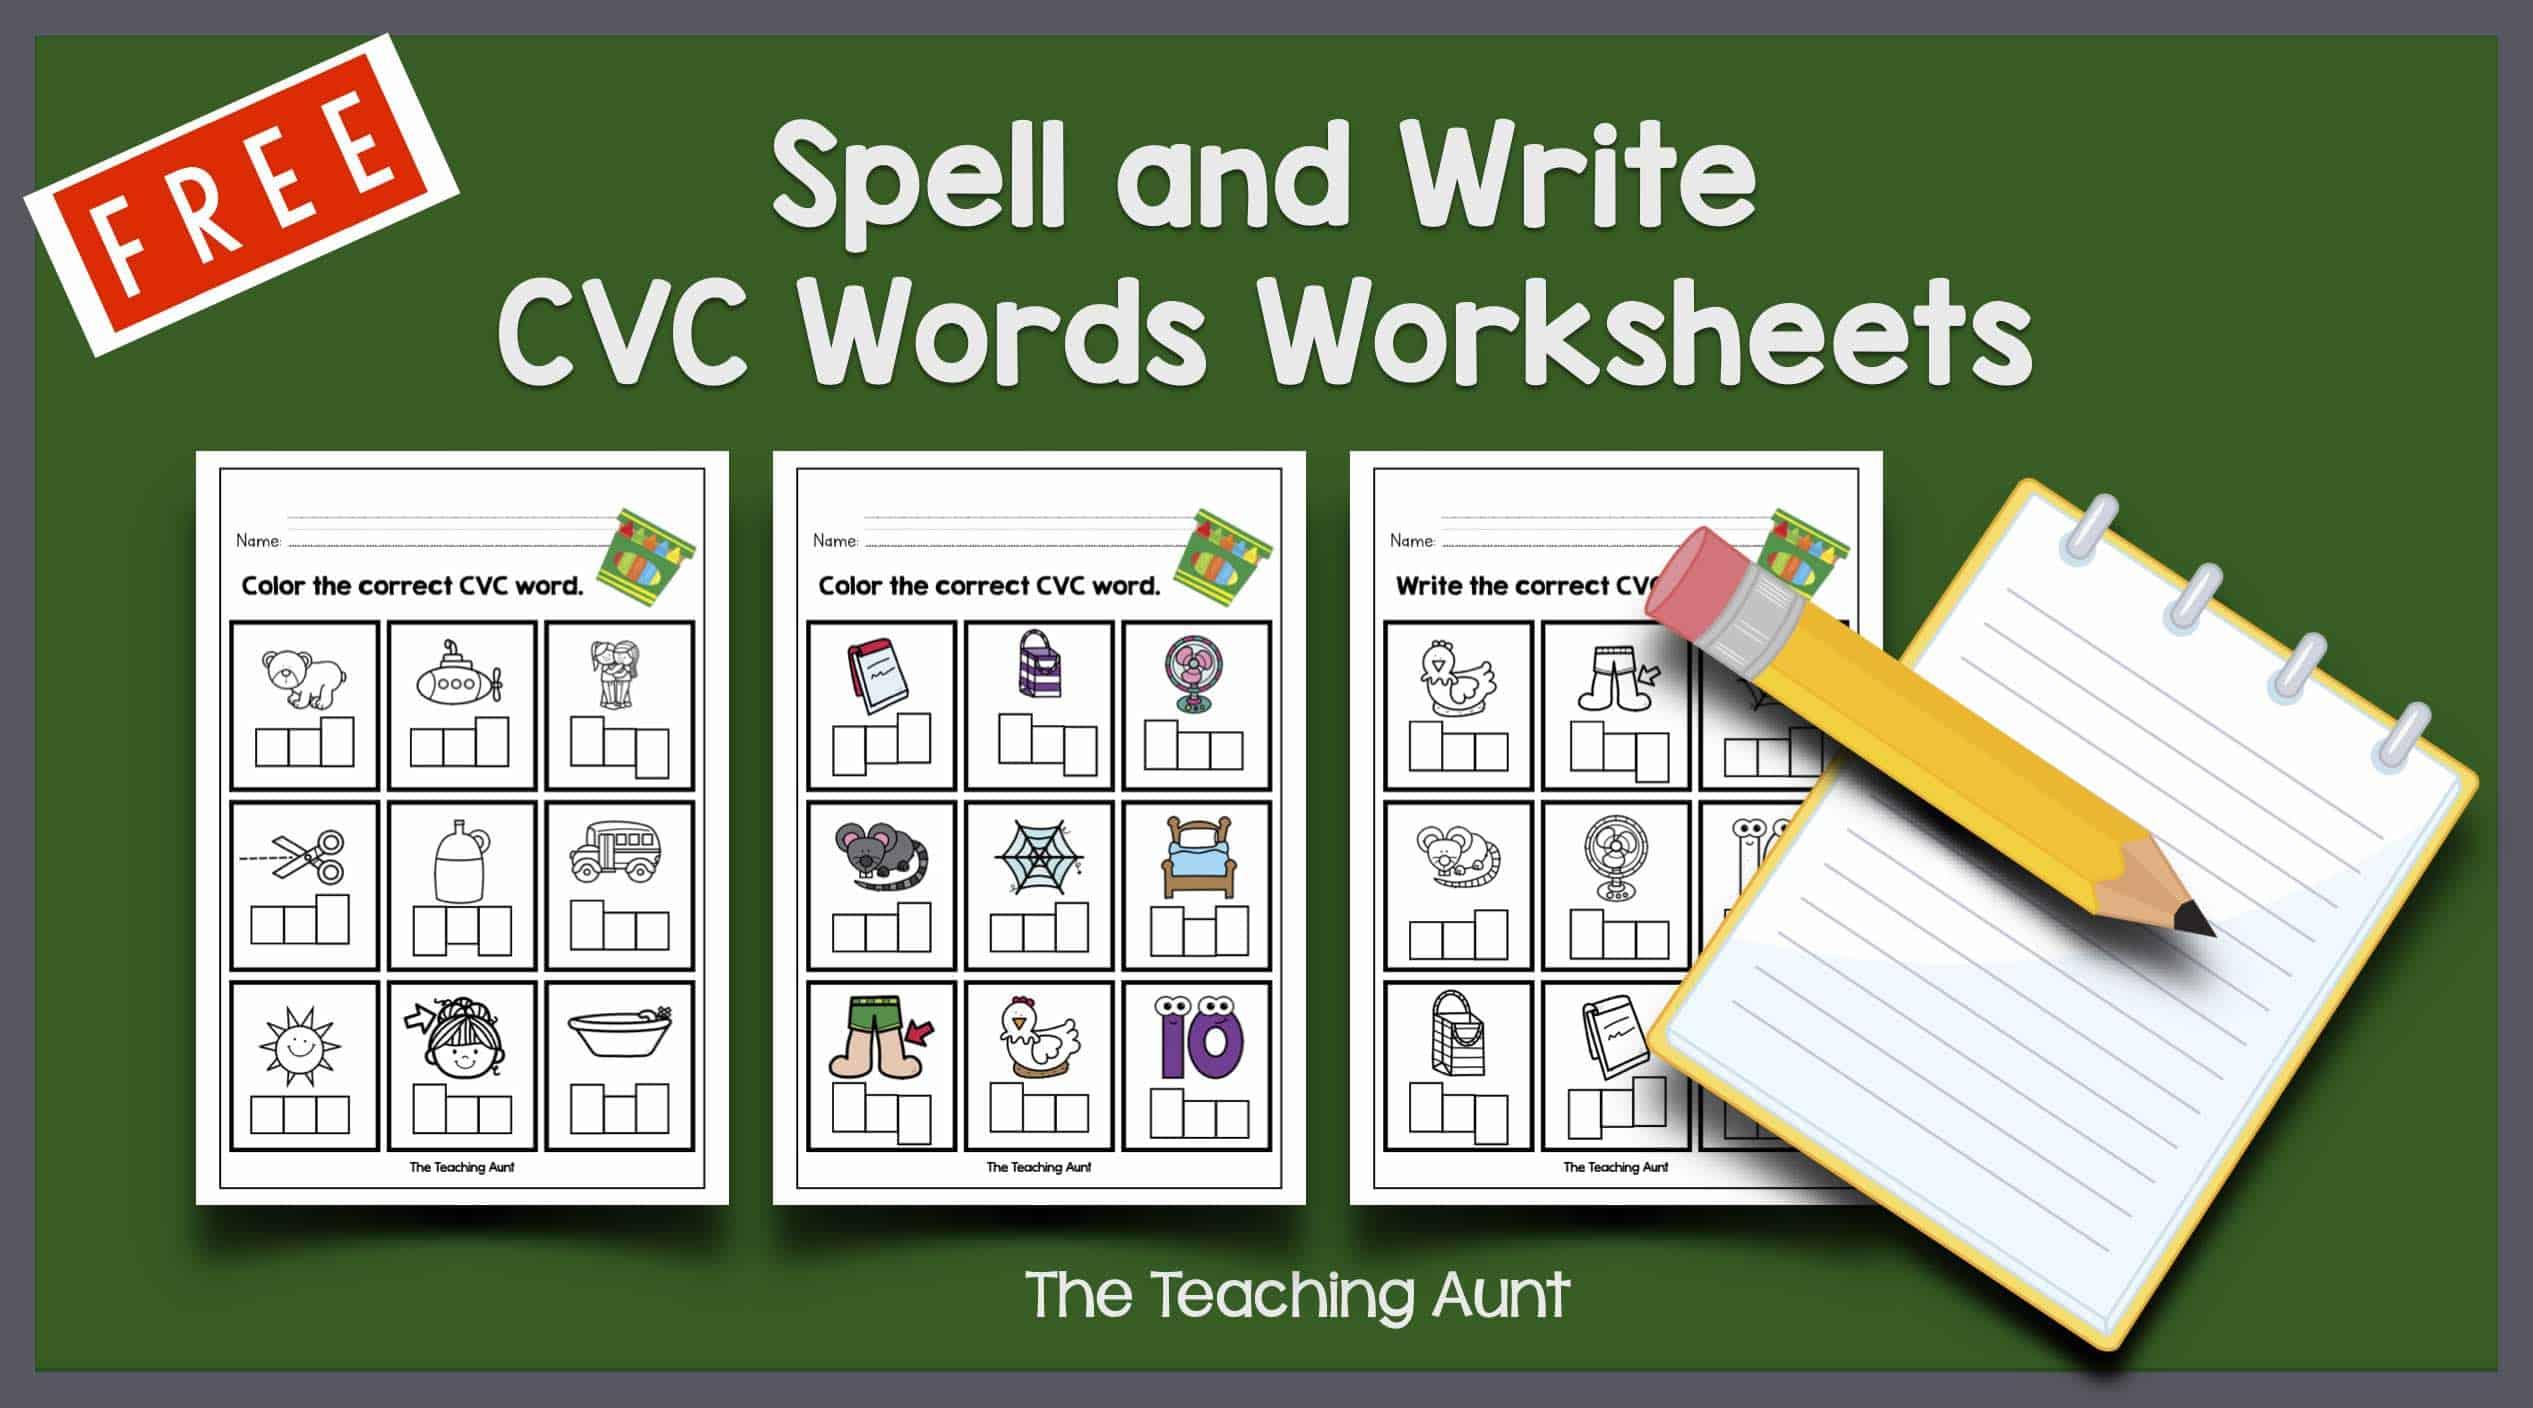 CVC Words Worksheets for Kindergarten